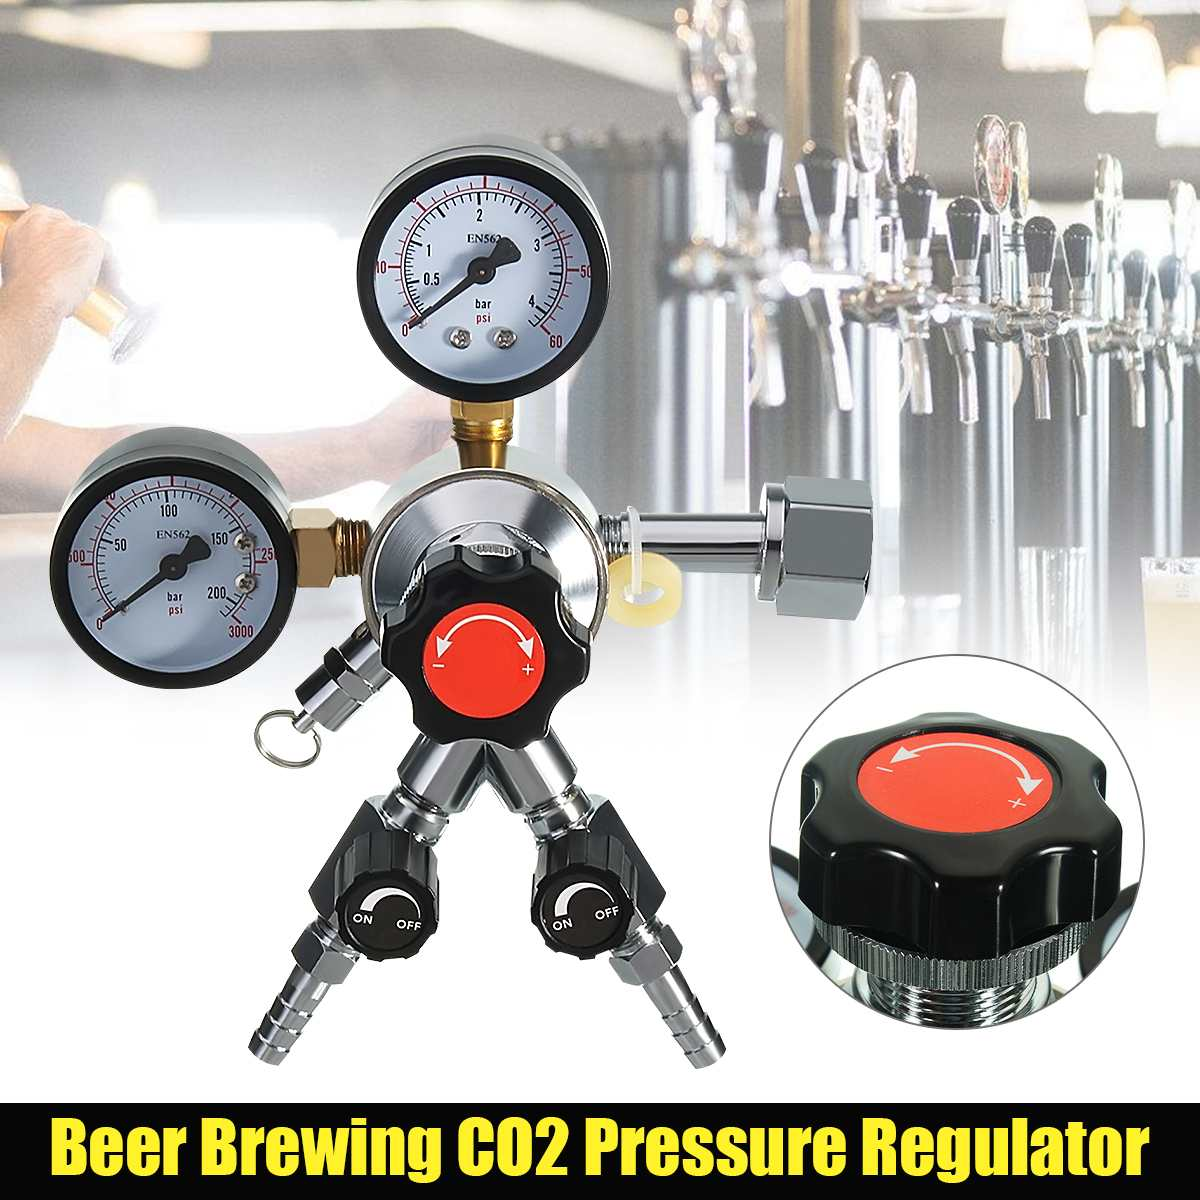 Homebrew CO2 Regulator Beer Brewing Kegerator Bar Triple Gauge Valve 5/16 CGA320 1/4NPT Bar AccessoriesHomebrew CO2 Regulator Beer Brewing Kegerator Bar Triple Gauge Valve 5/16 CGA320 1/4NPT Bar Accessories